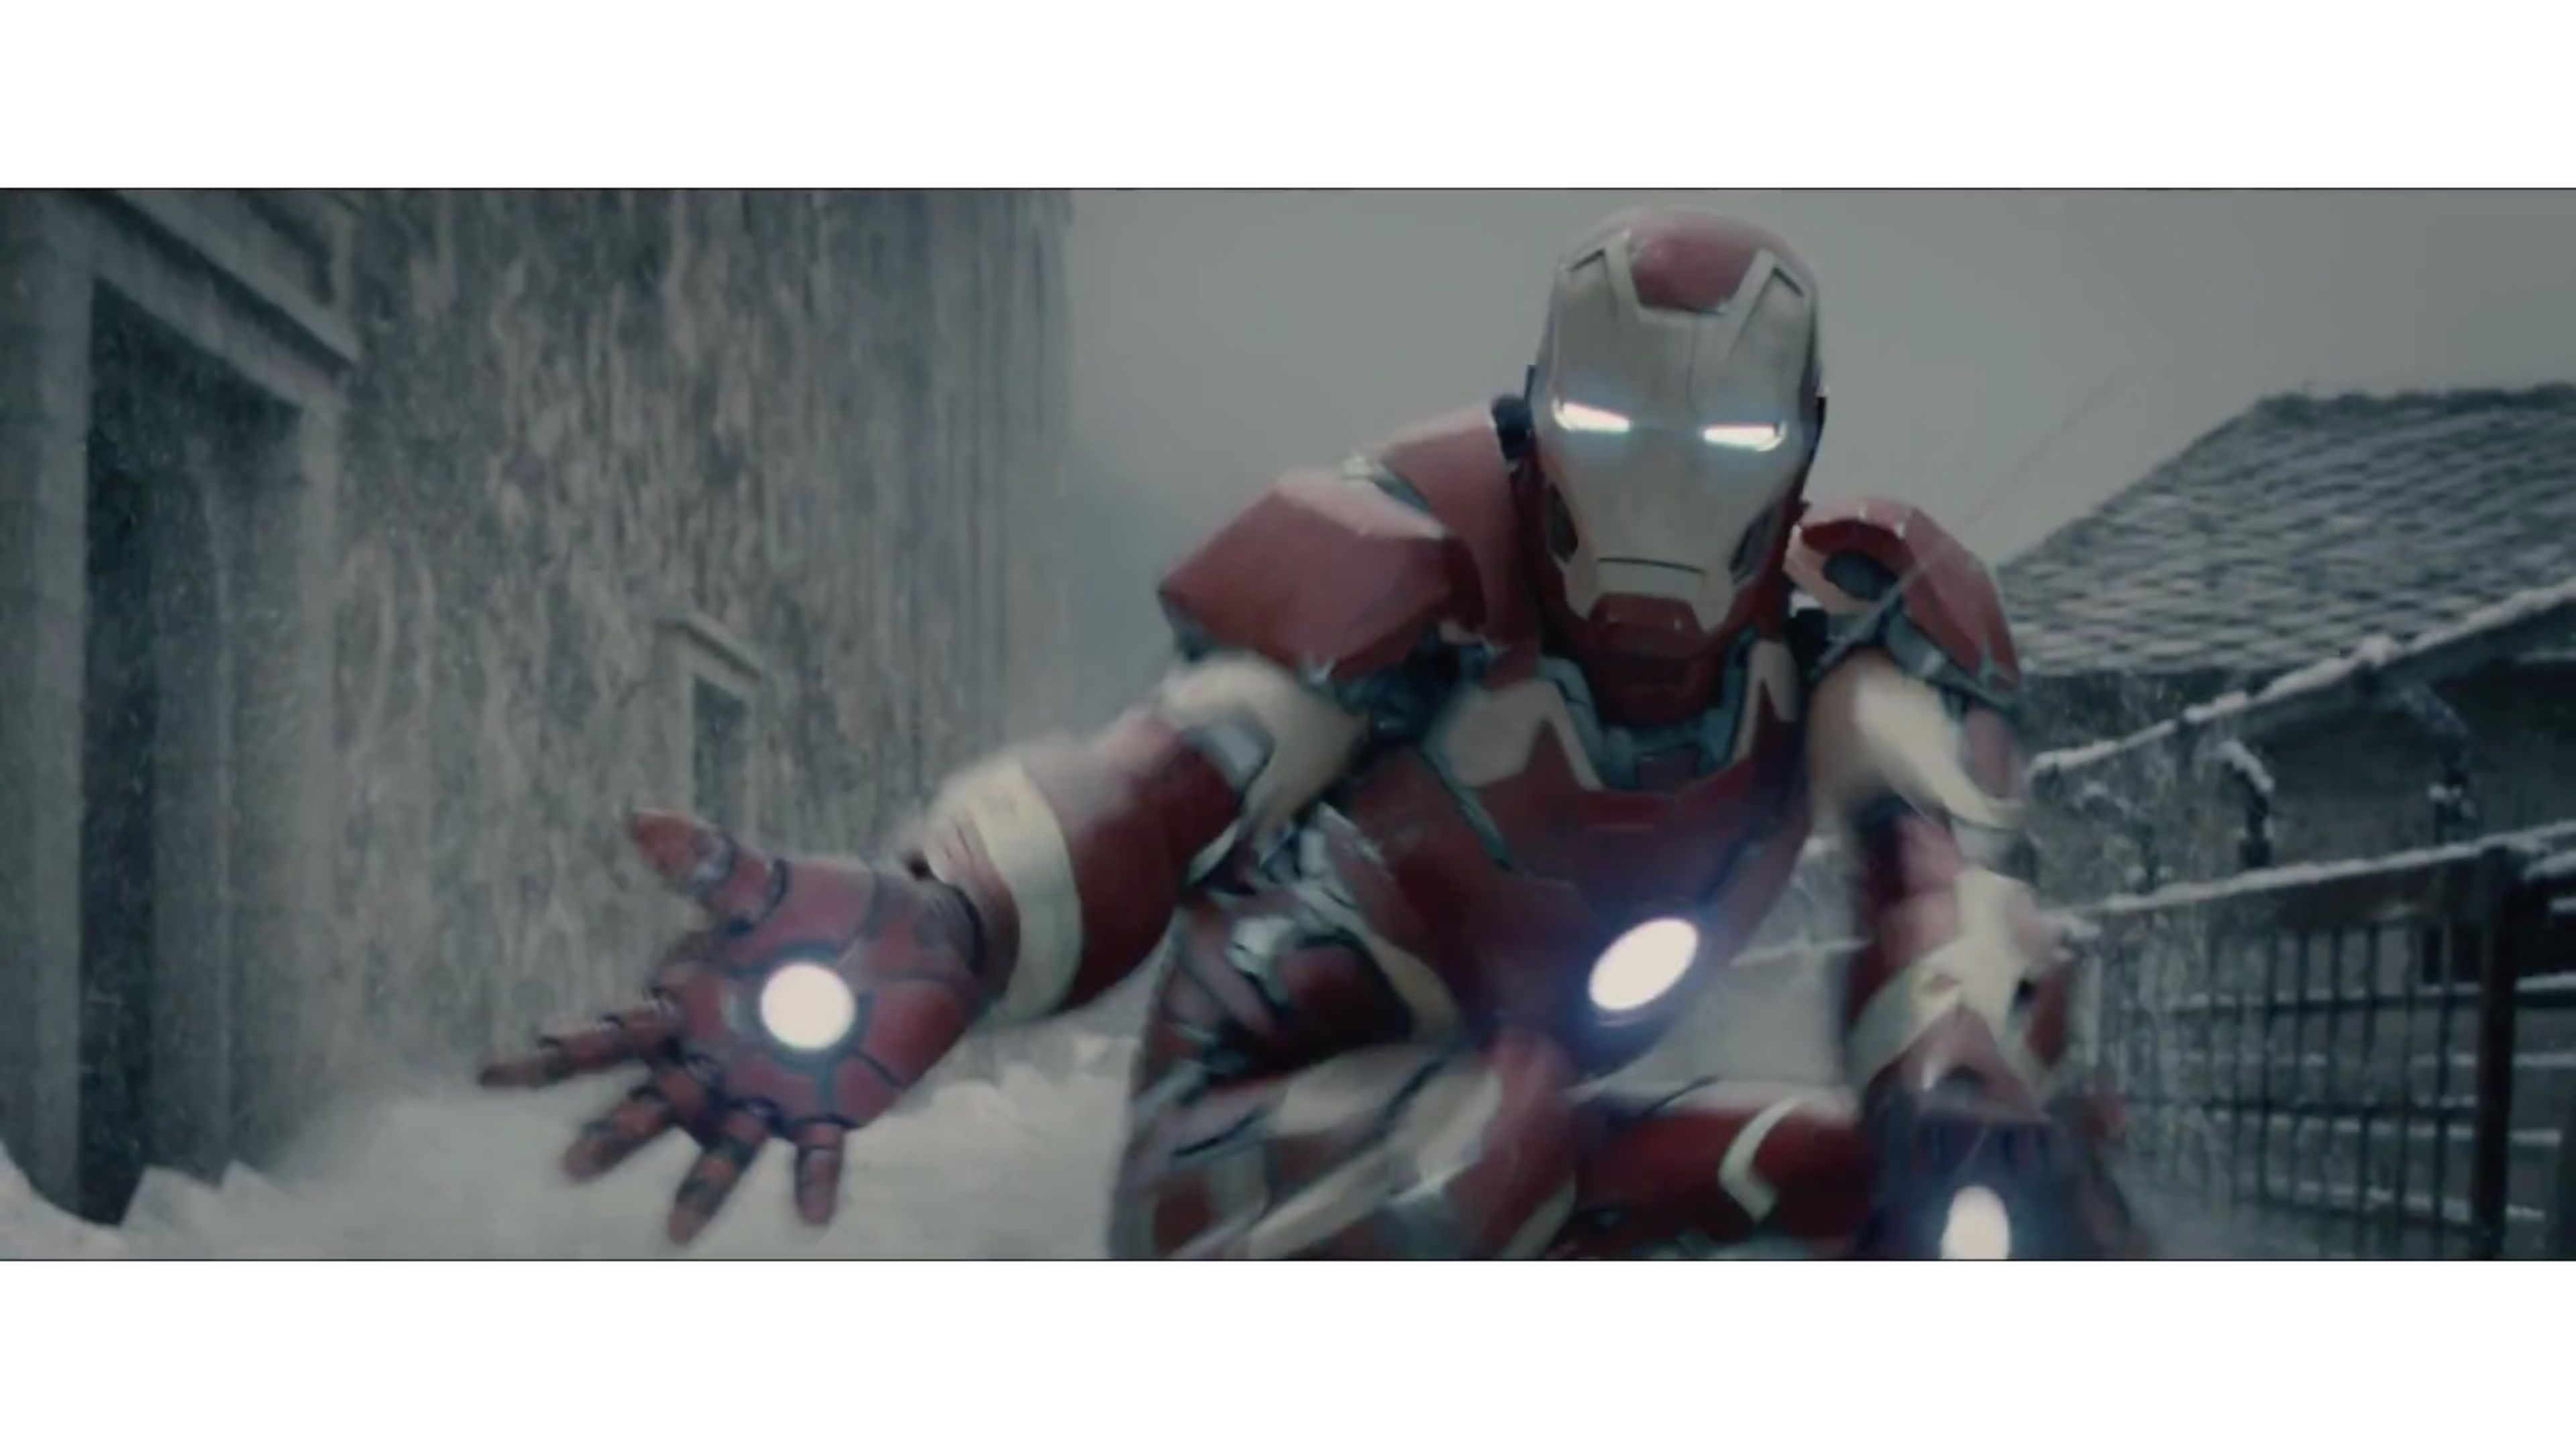 Iron Man Avengers Age Of Ultron Wallpaper